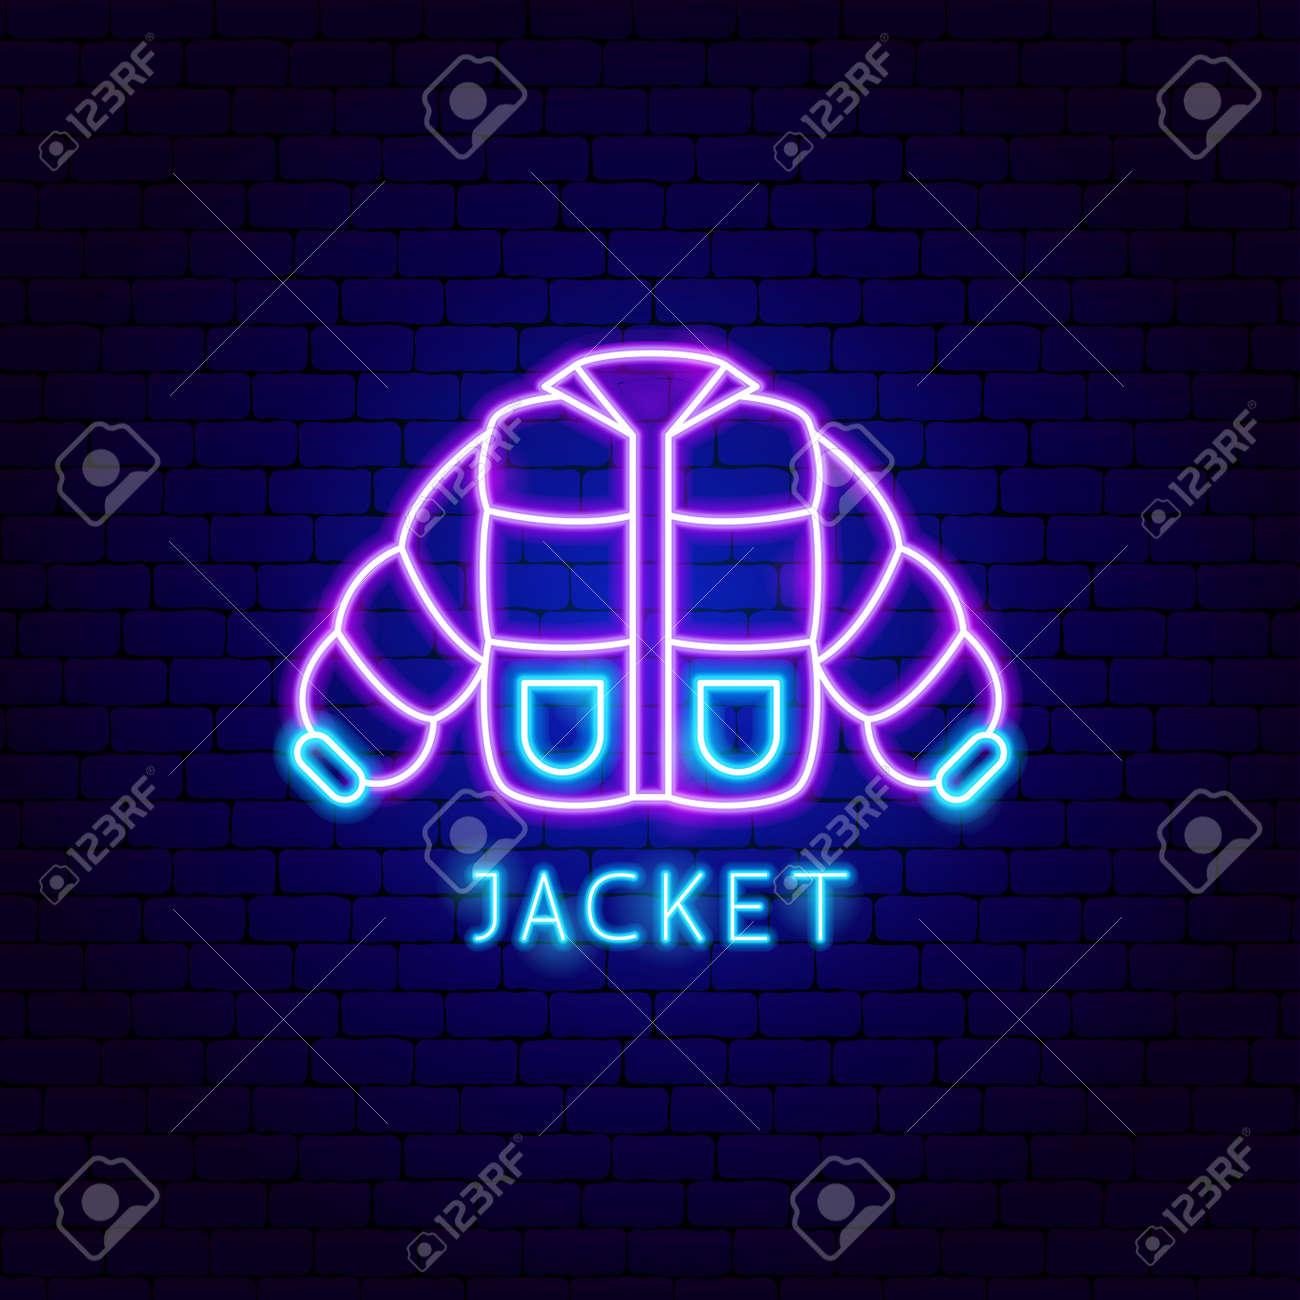 Jacket Neon Label - 168963055